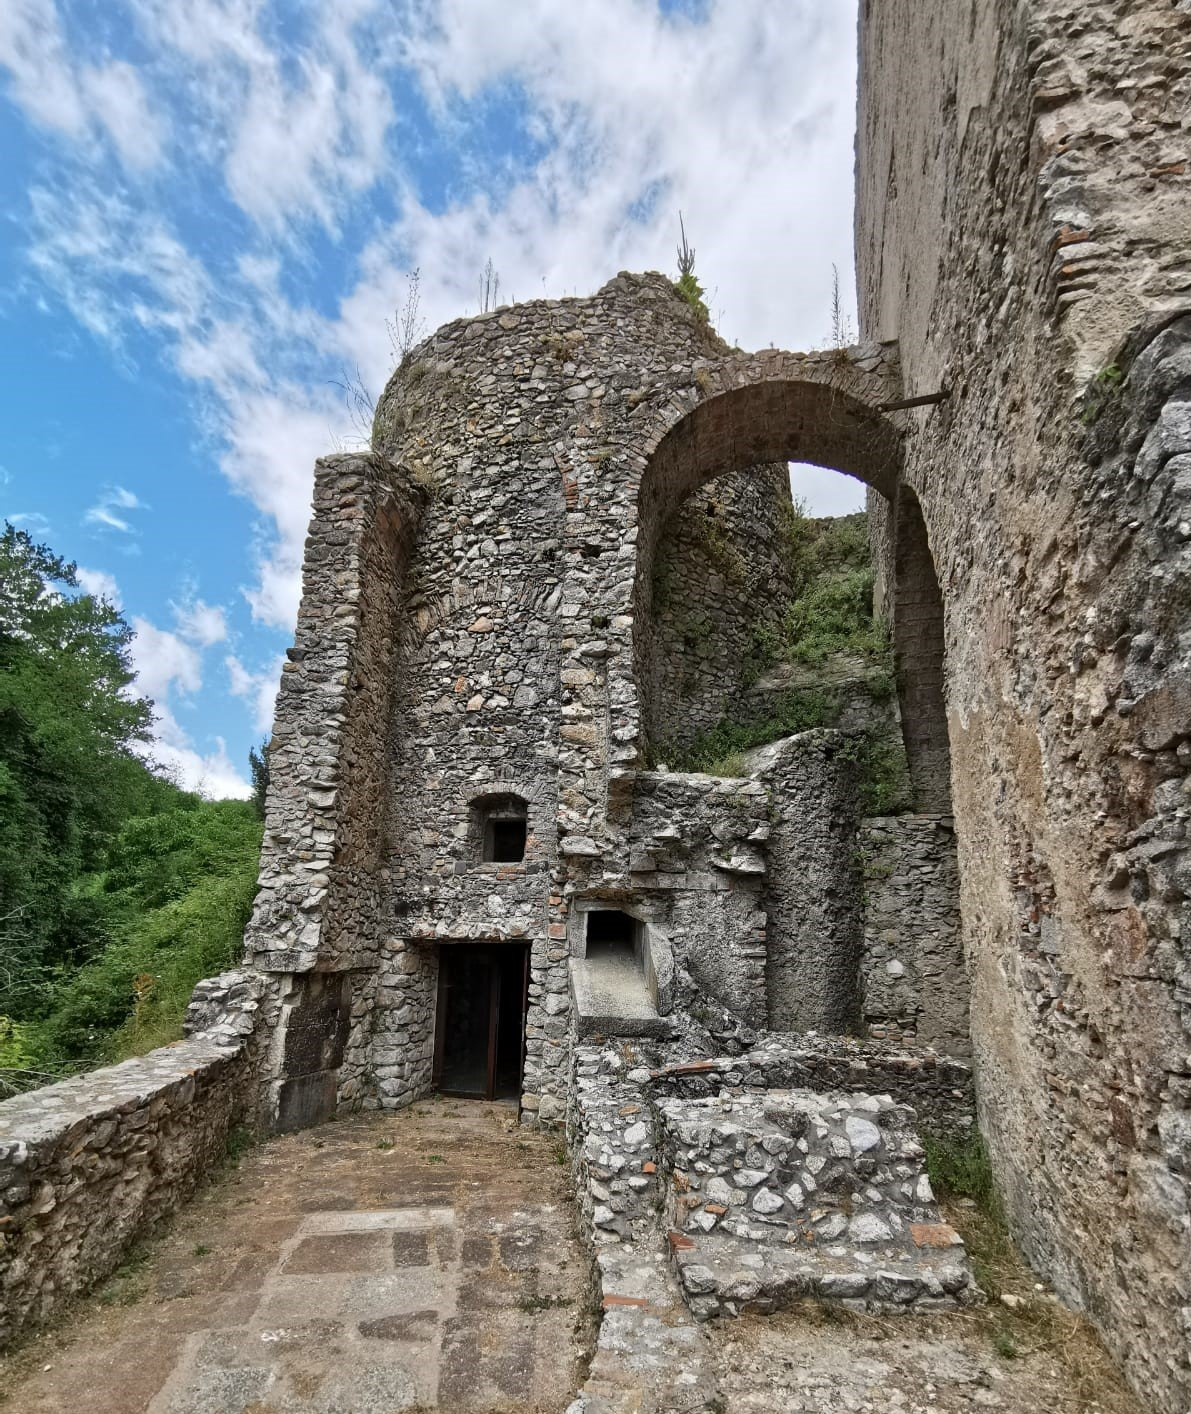 Calabria: mare, trekking e archeologia industriale